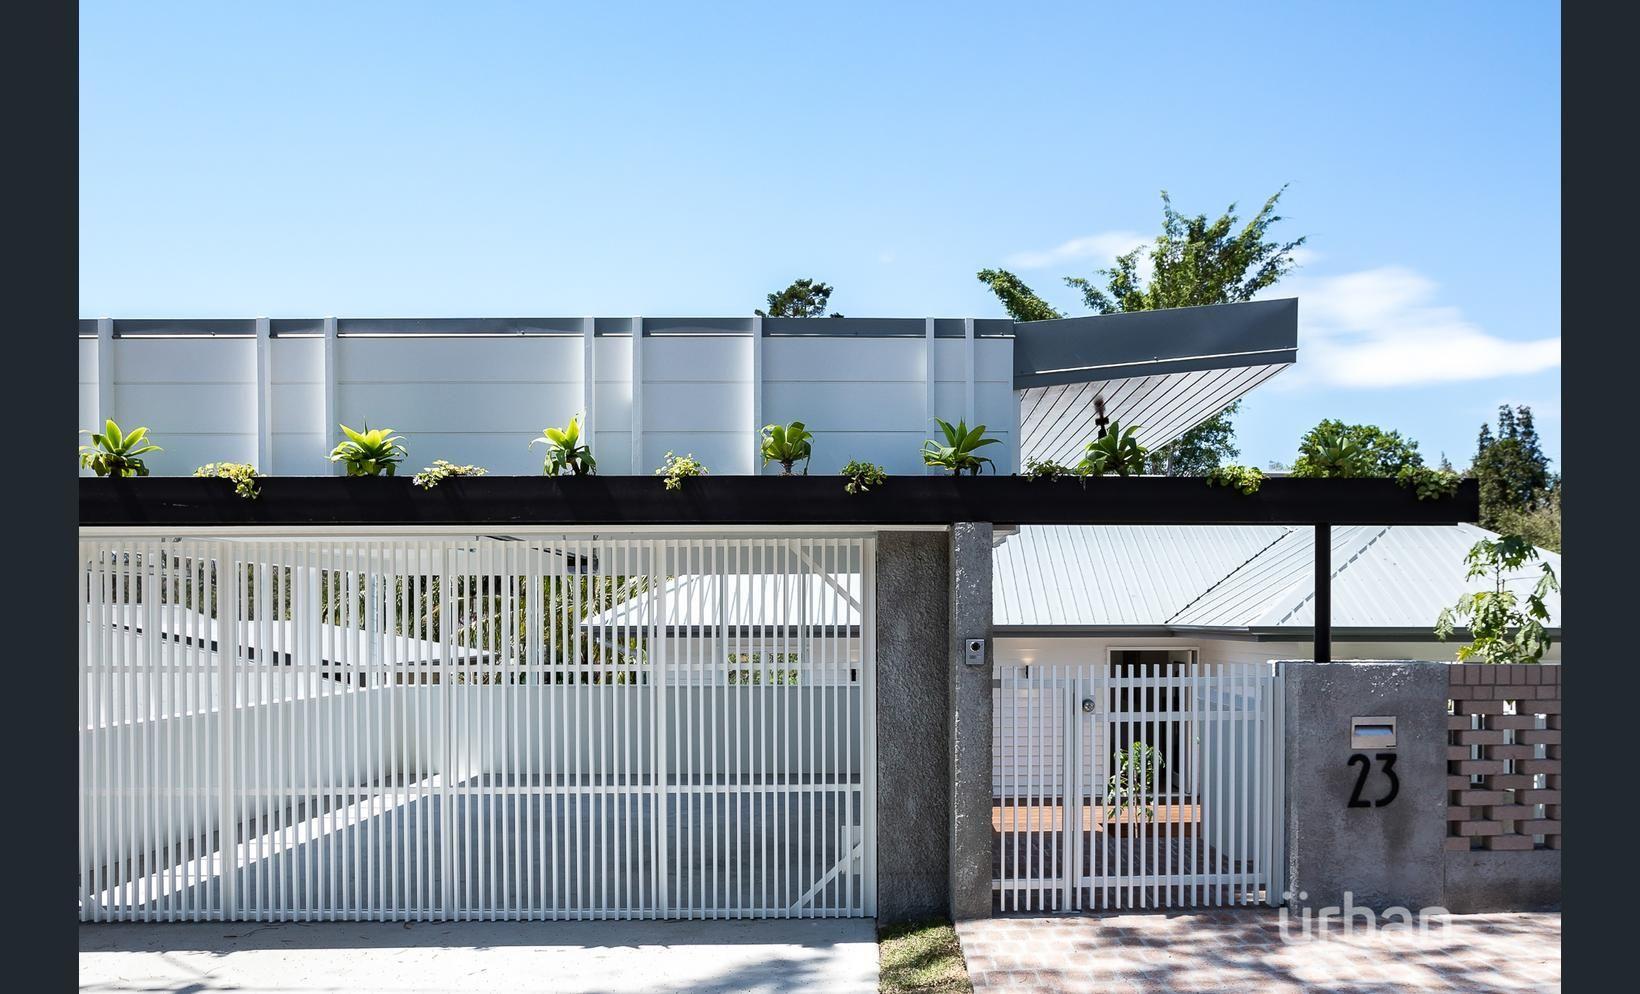 23 Mahara Street Bardon Qld 4065 House for Sale